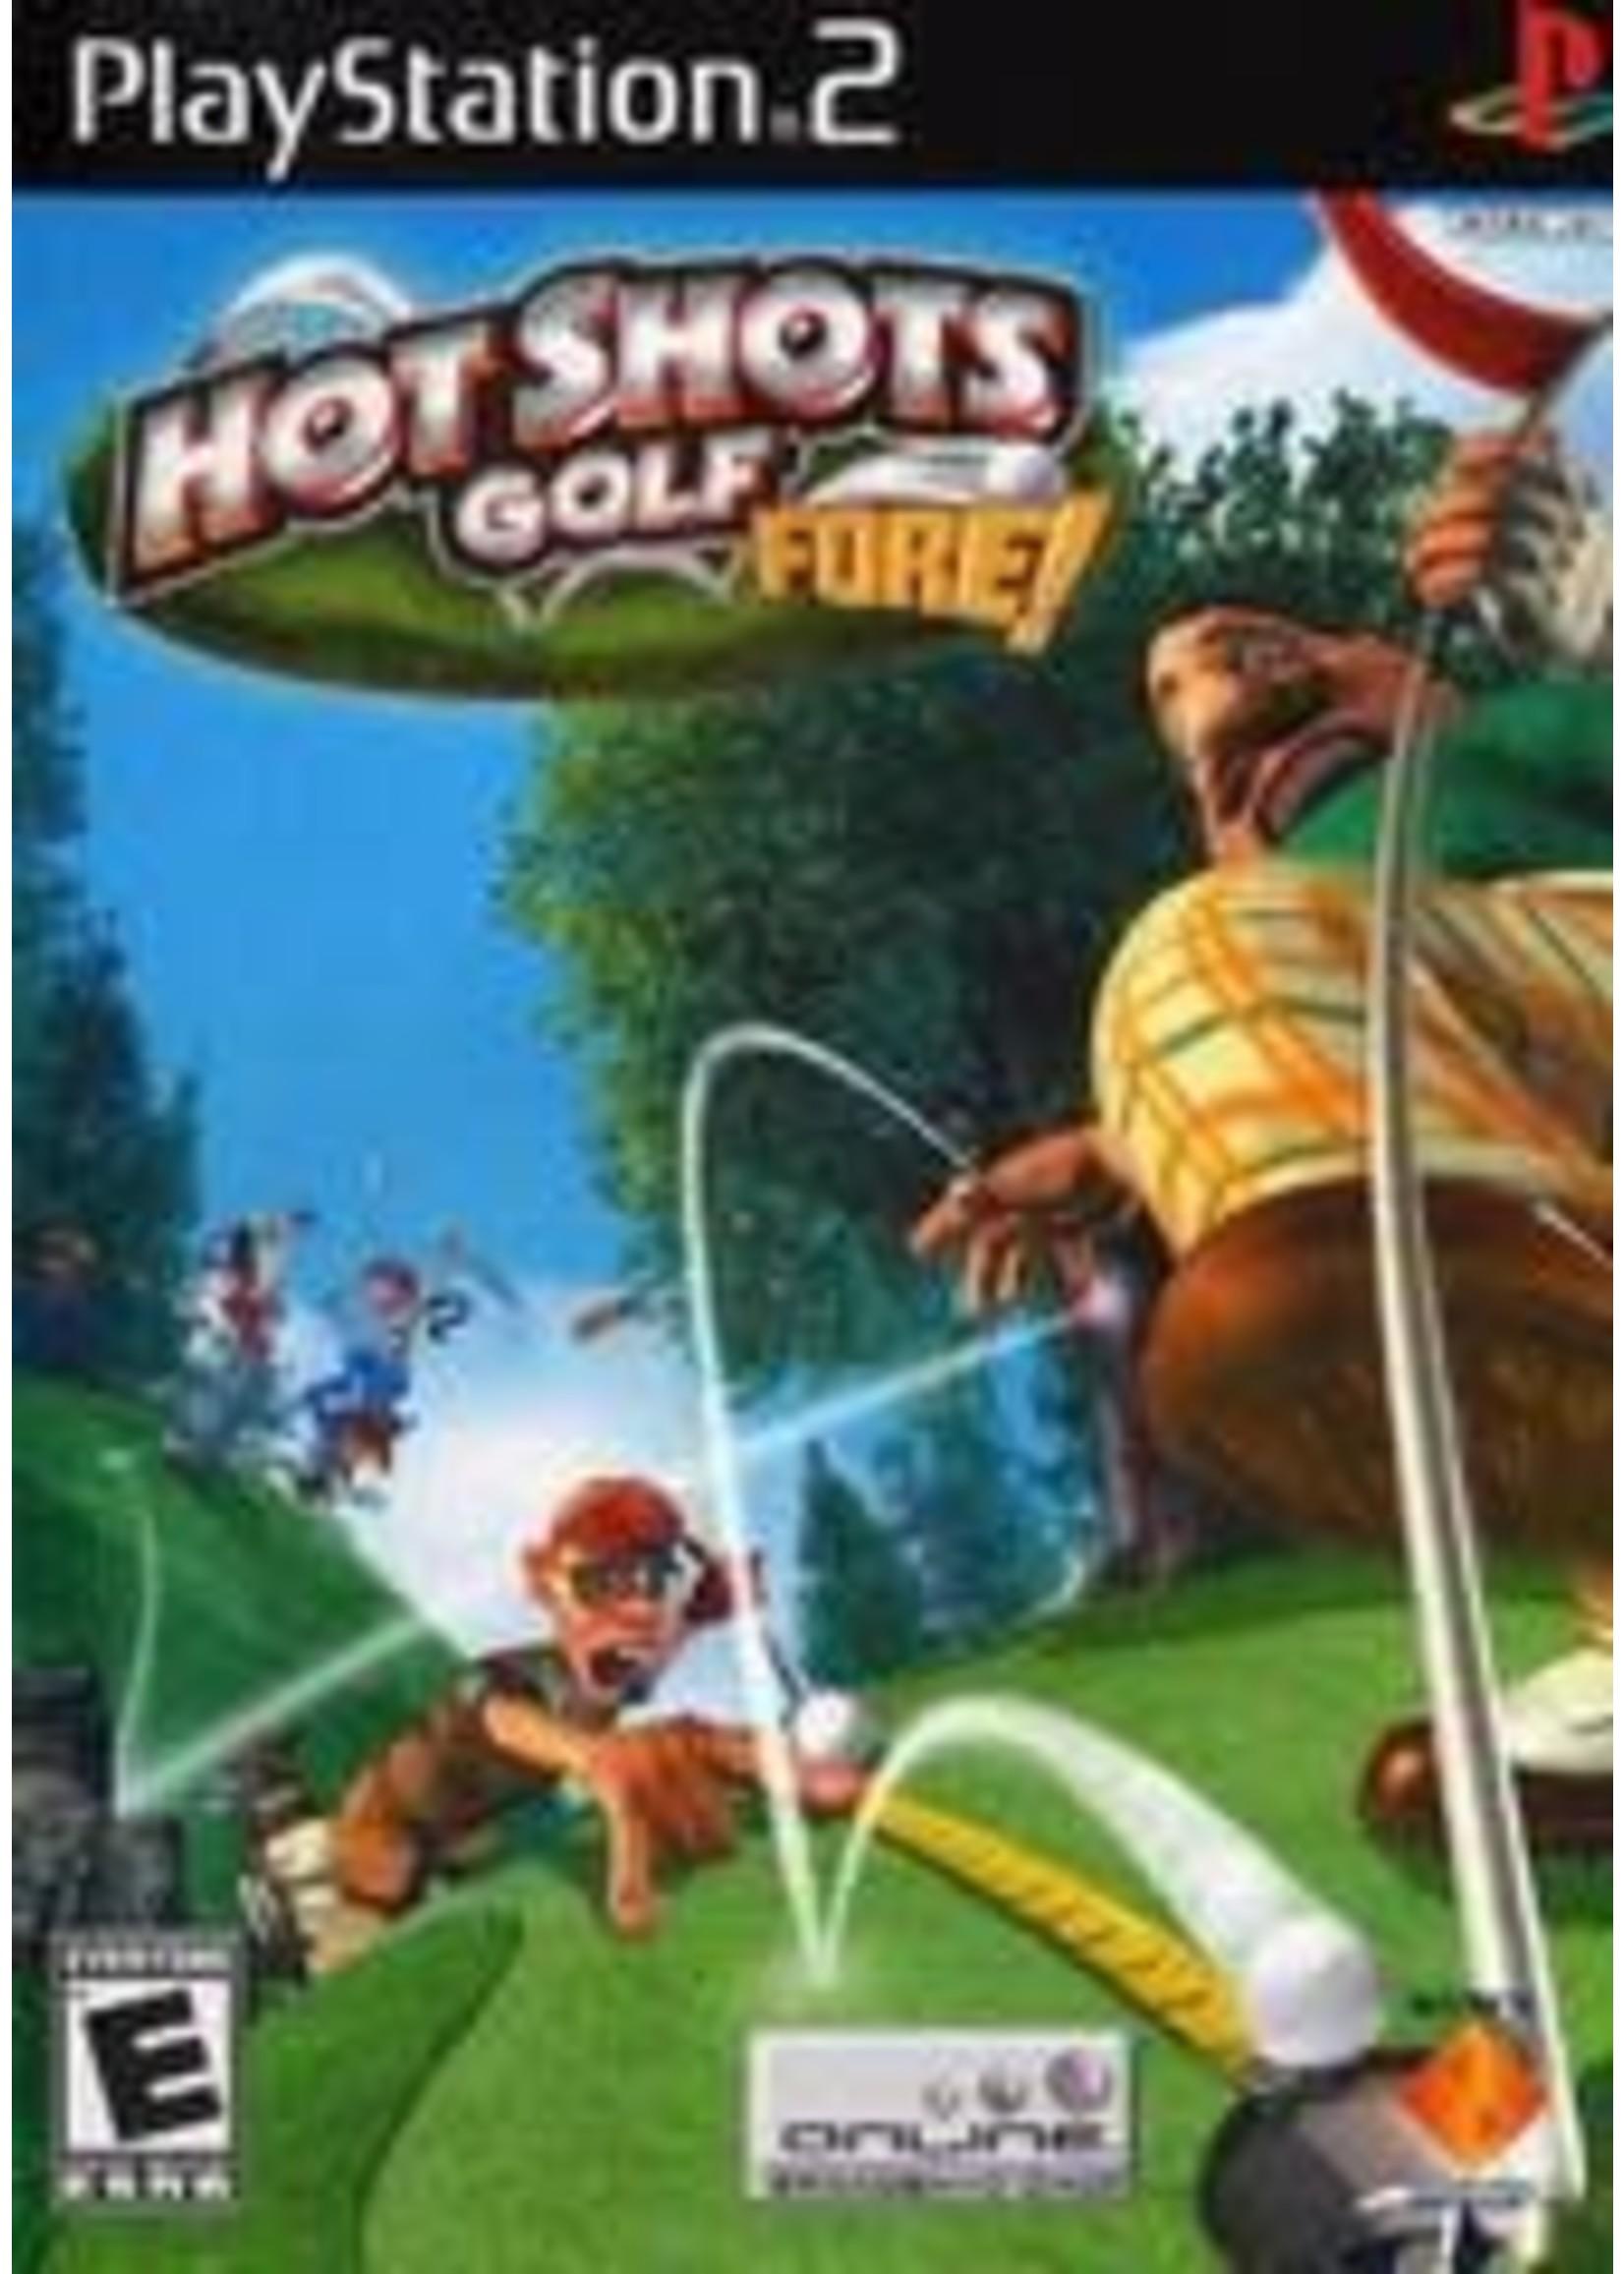 Hot Shots Golf Fore Playstation 2